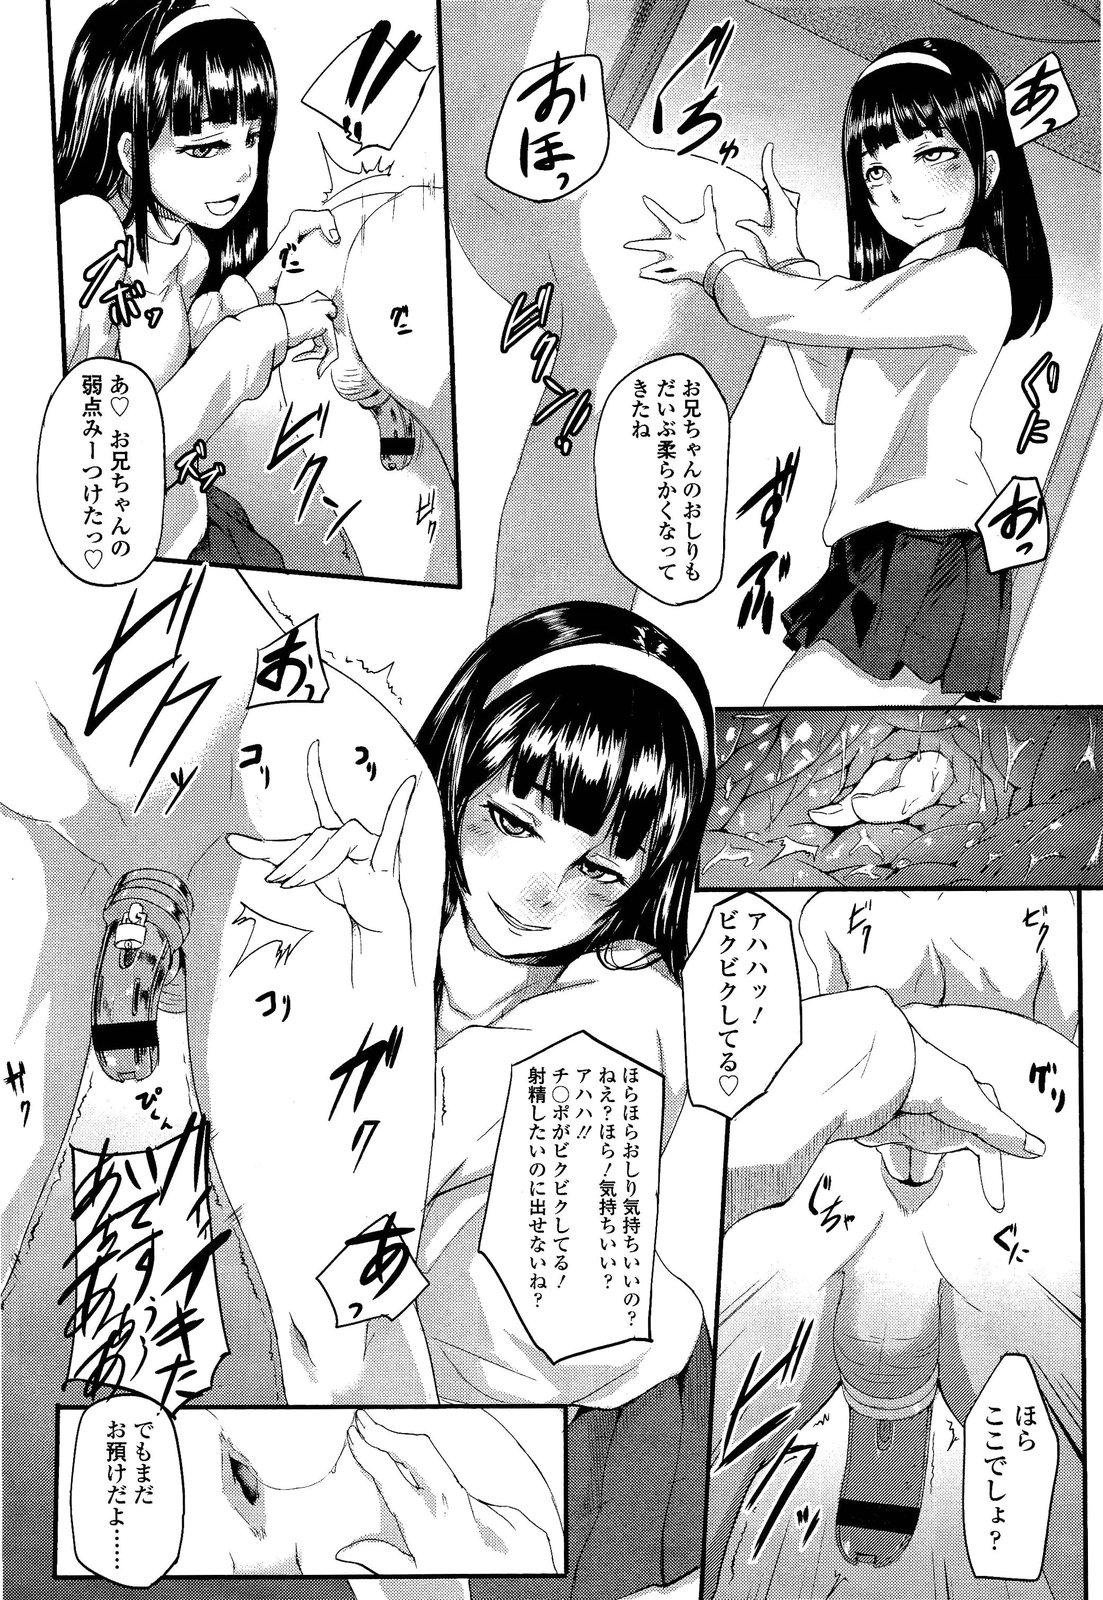 Girls forM Vol. 02 253